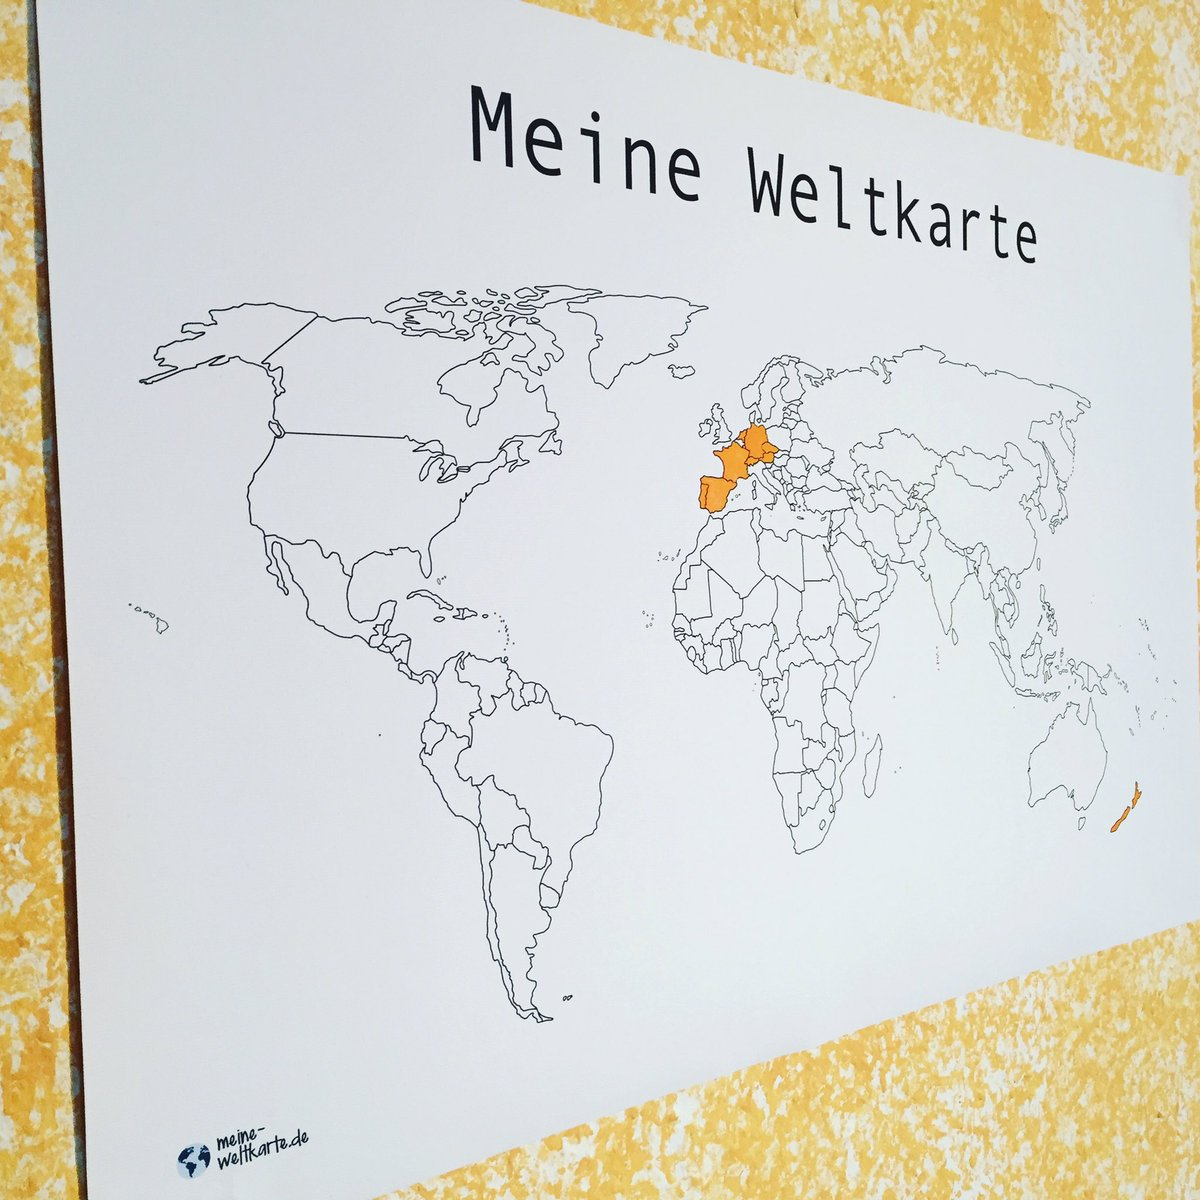 Meine Weltkarte De On Twitter Unser Alleskonner Die Weltkarte